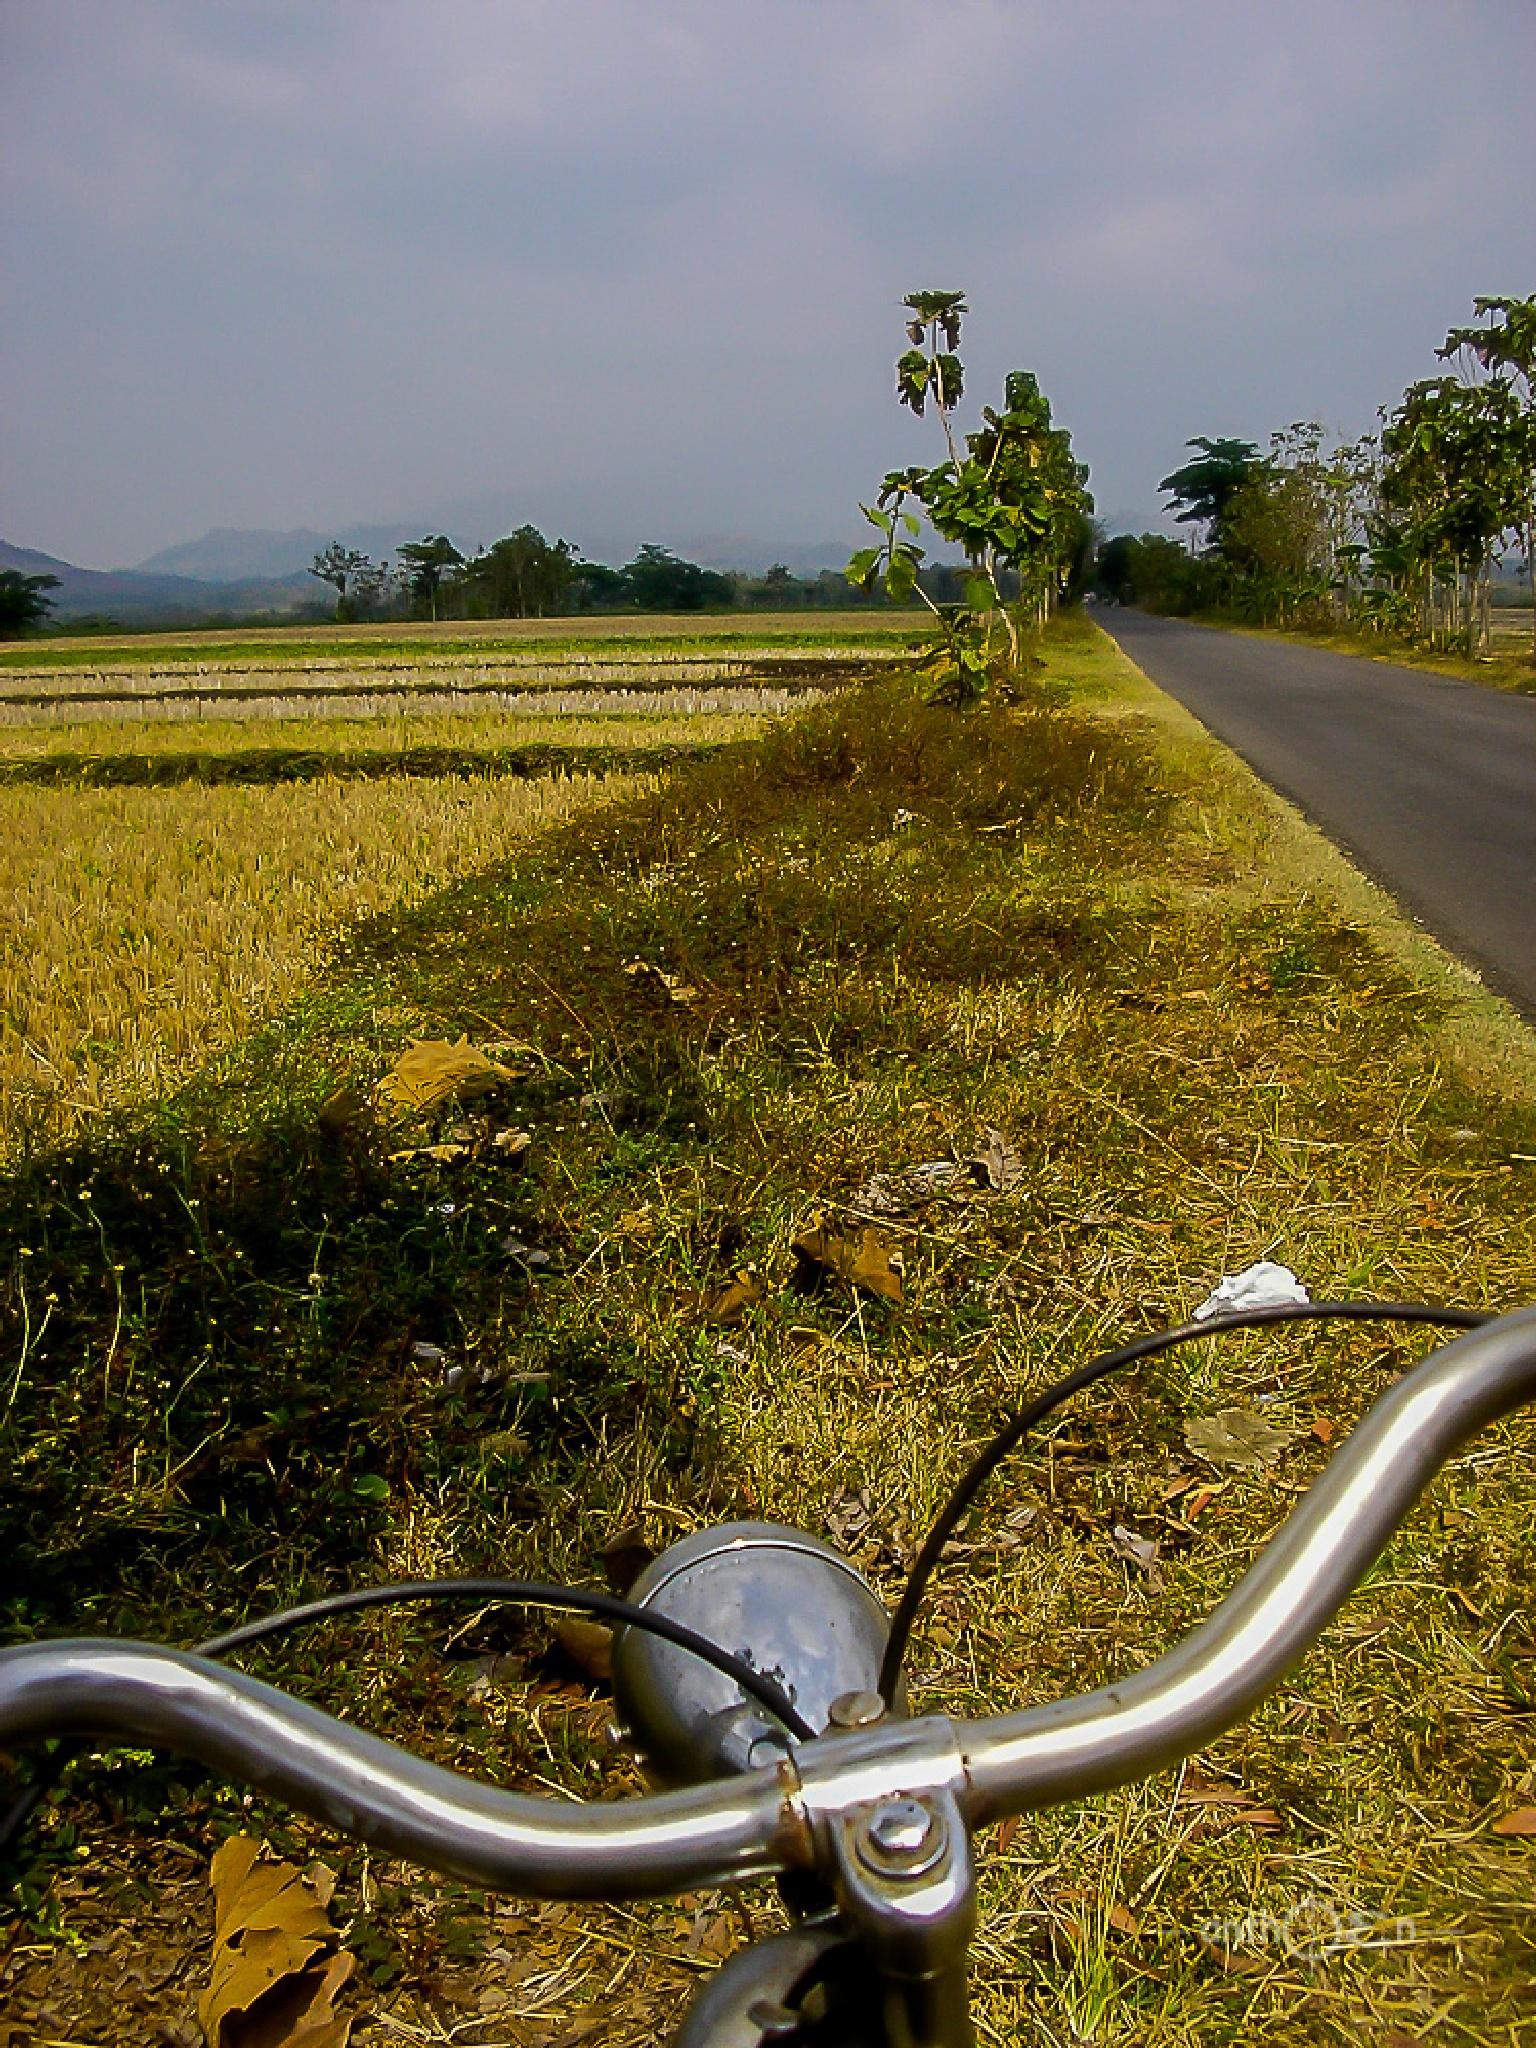 riding on the road by Anthoen Luciferano Karnanta